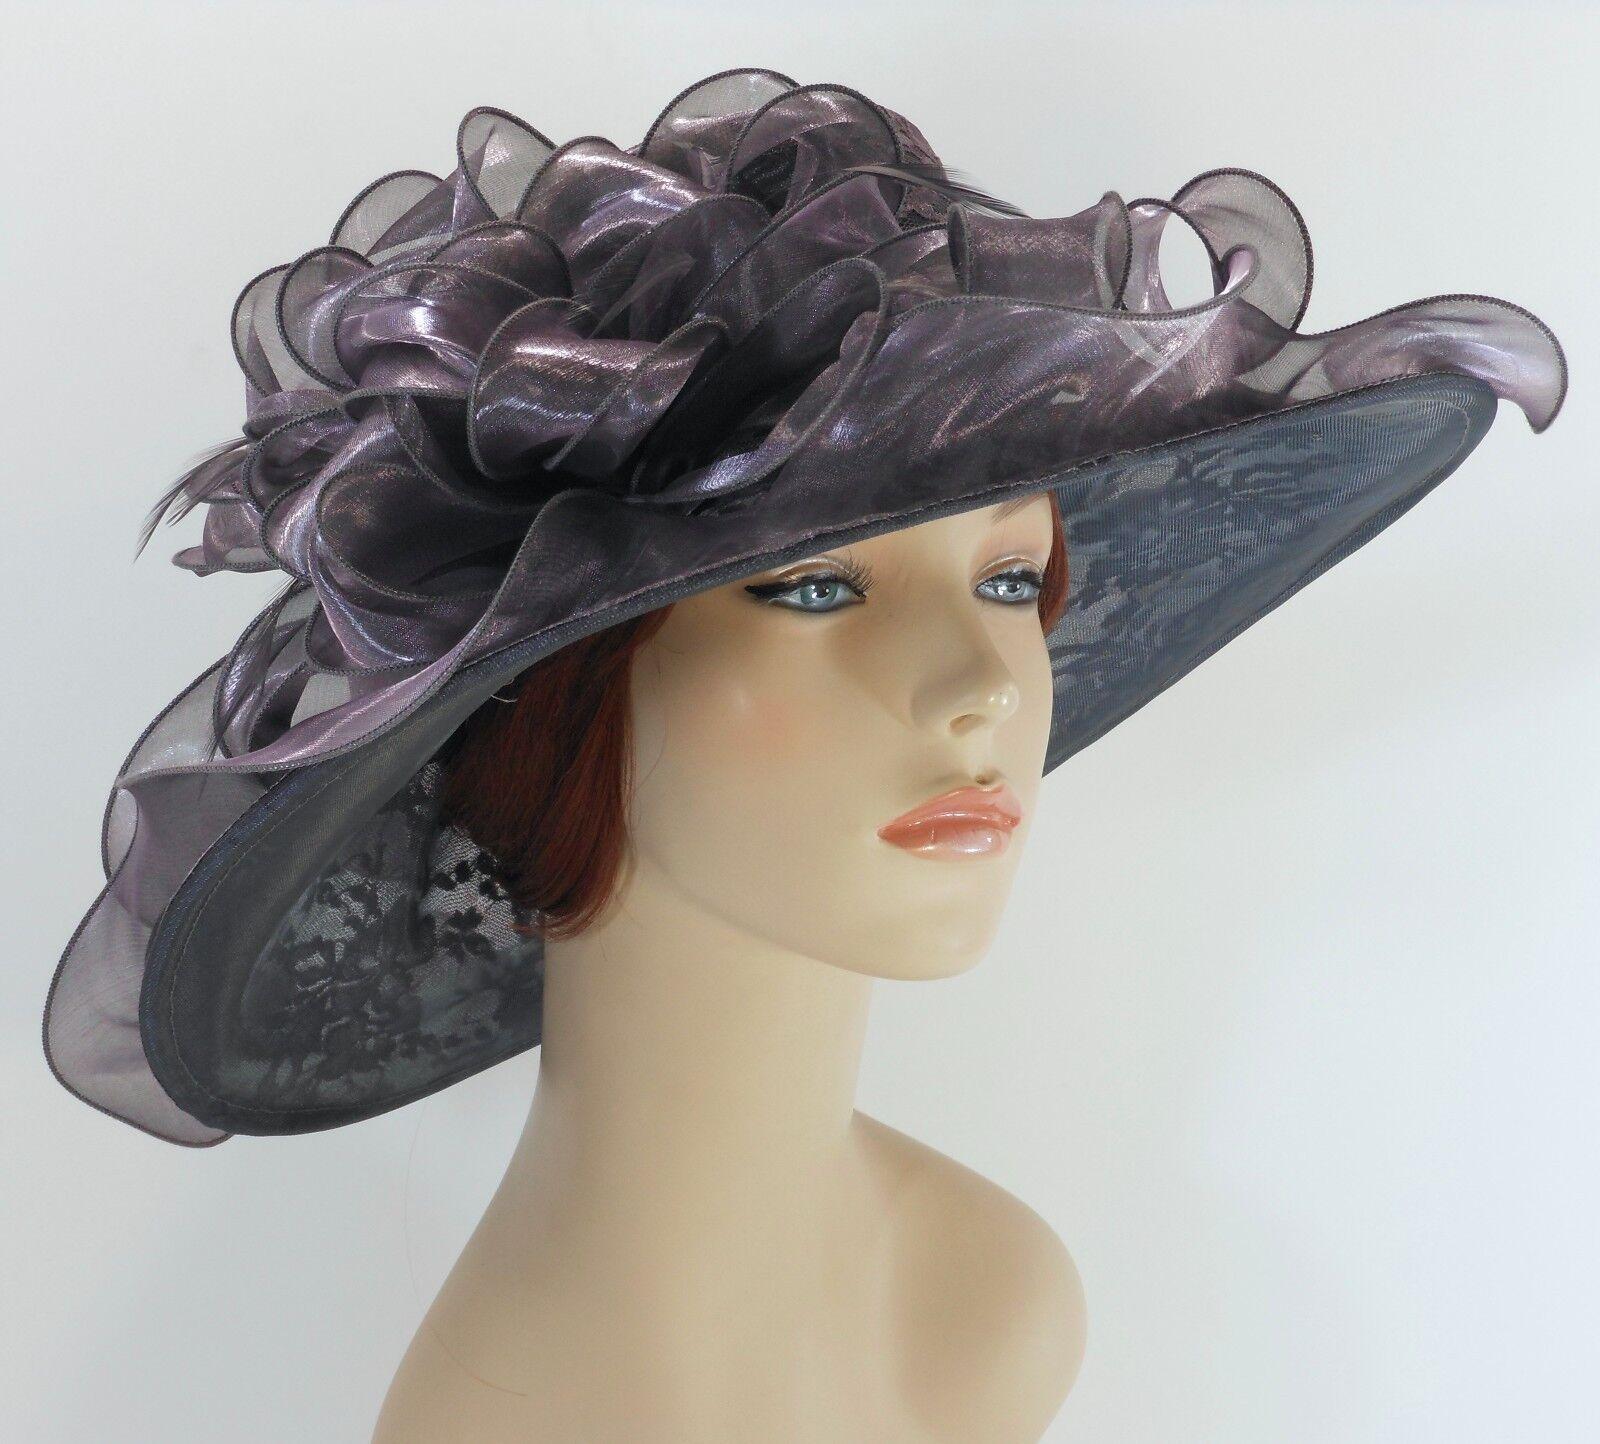 New Church Kentucky Derby Party Wedding Organza Lace Dress Hat 1593 Gray